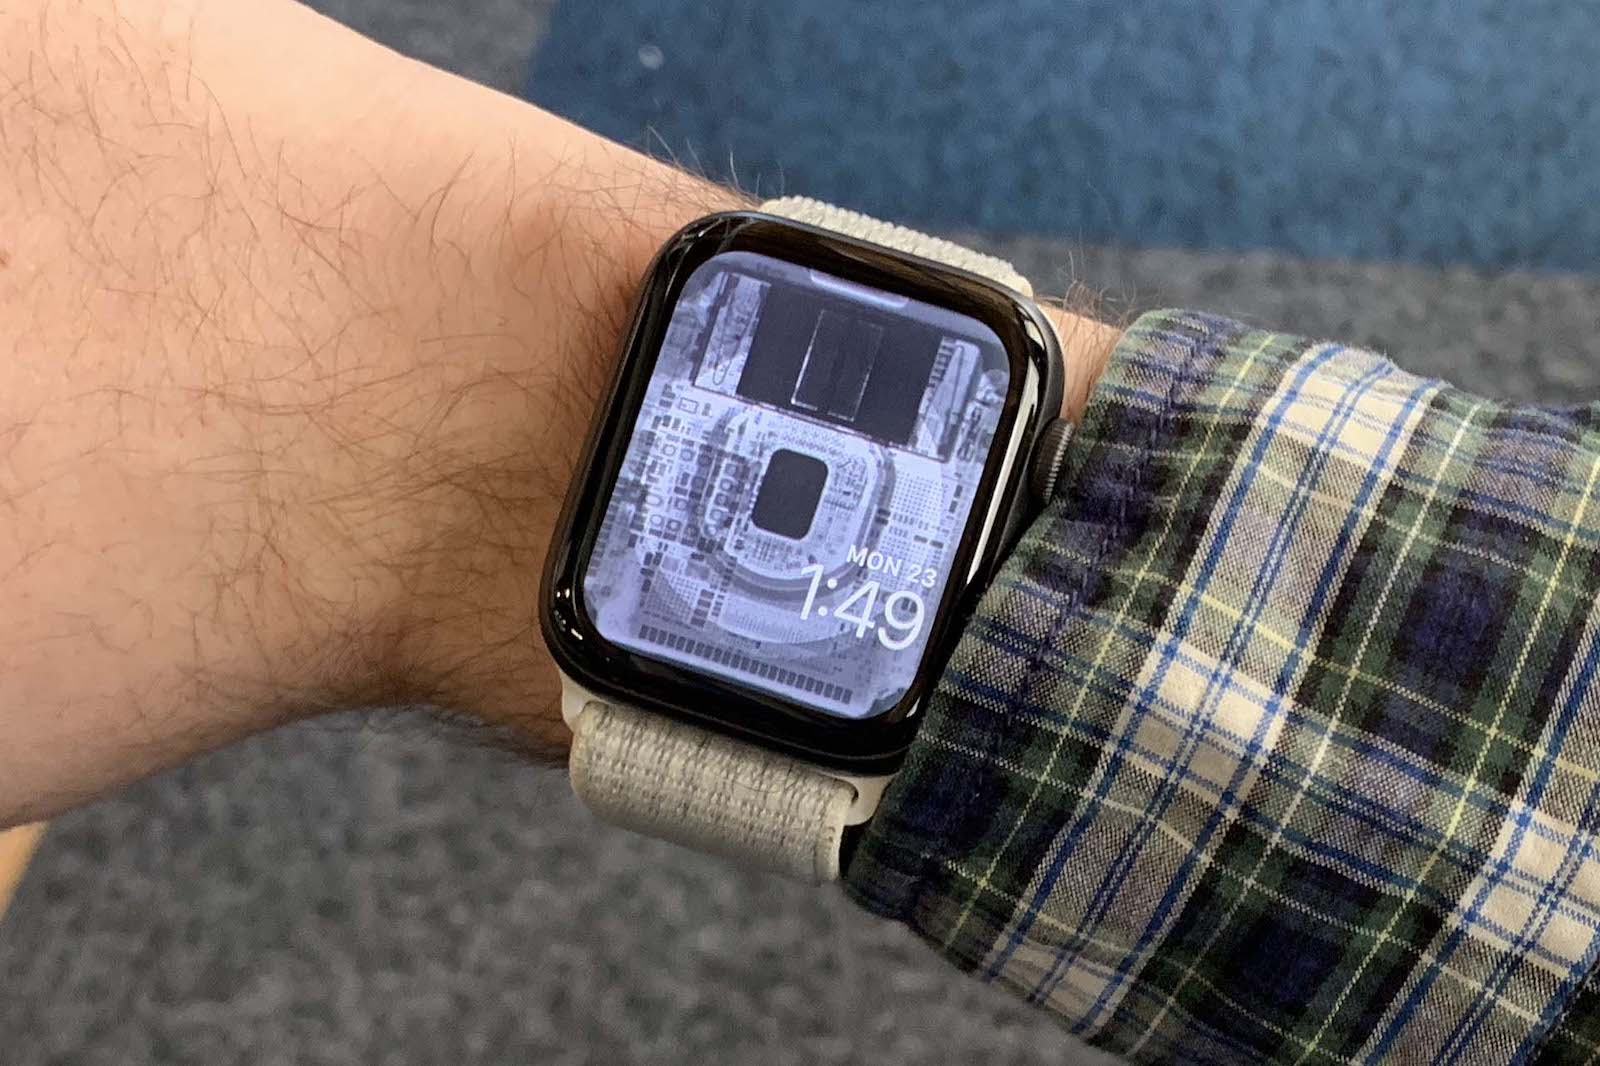 Ifixit Apple Watchの内部が透けて見える壁紙を公開 ゴリミー